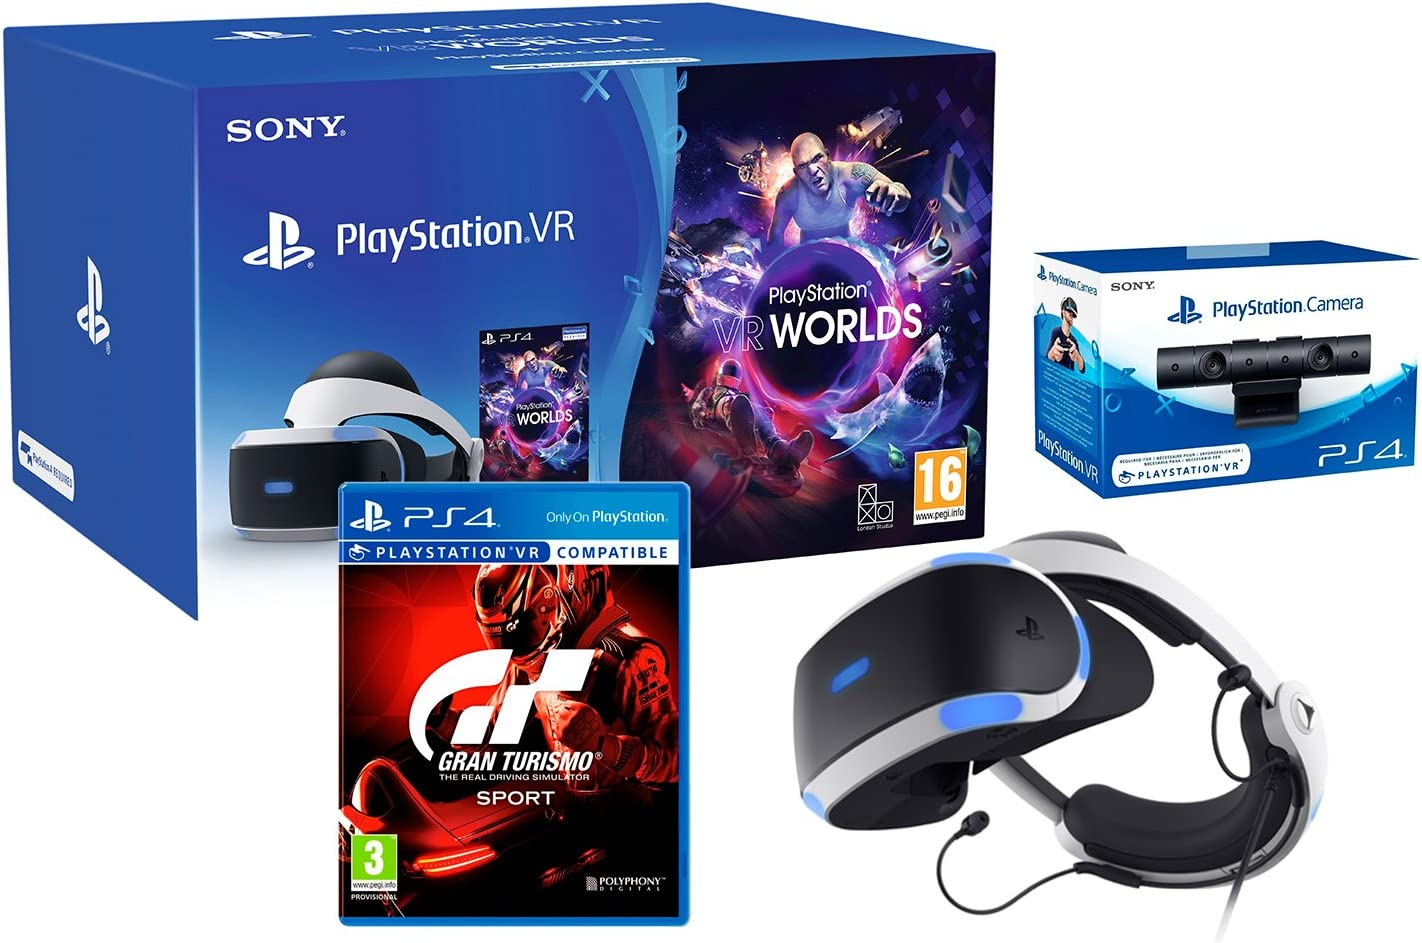 VR2 Negro GT Sport Pack + VR Worlds + PS4 Cámera VR GT Sport Pack + VR Worlds + PS4 Cámera VR: Amazon.es: Informática